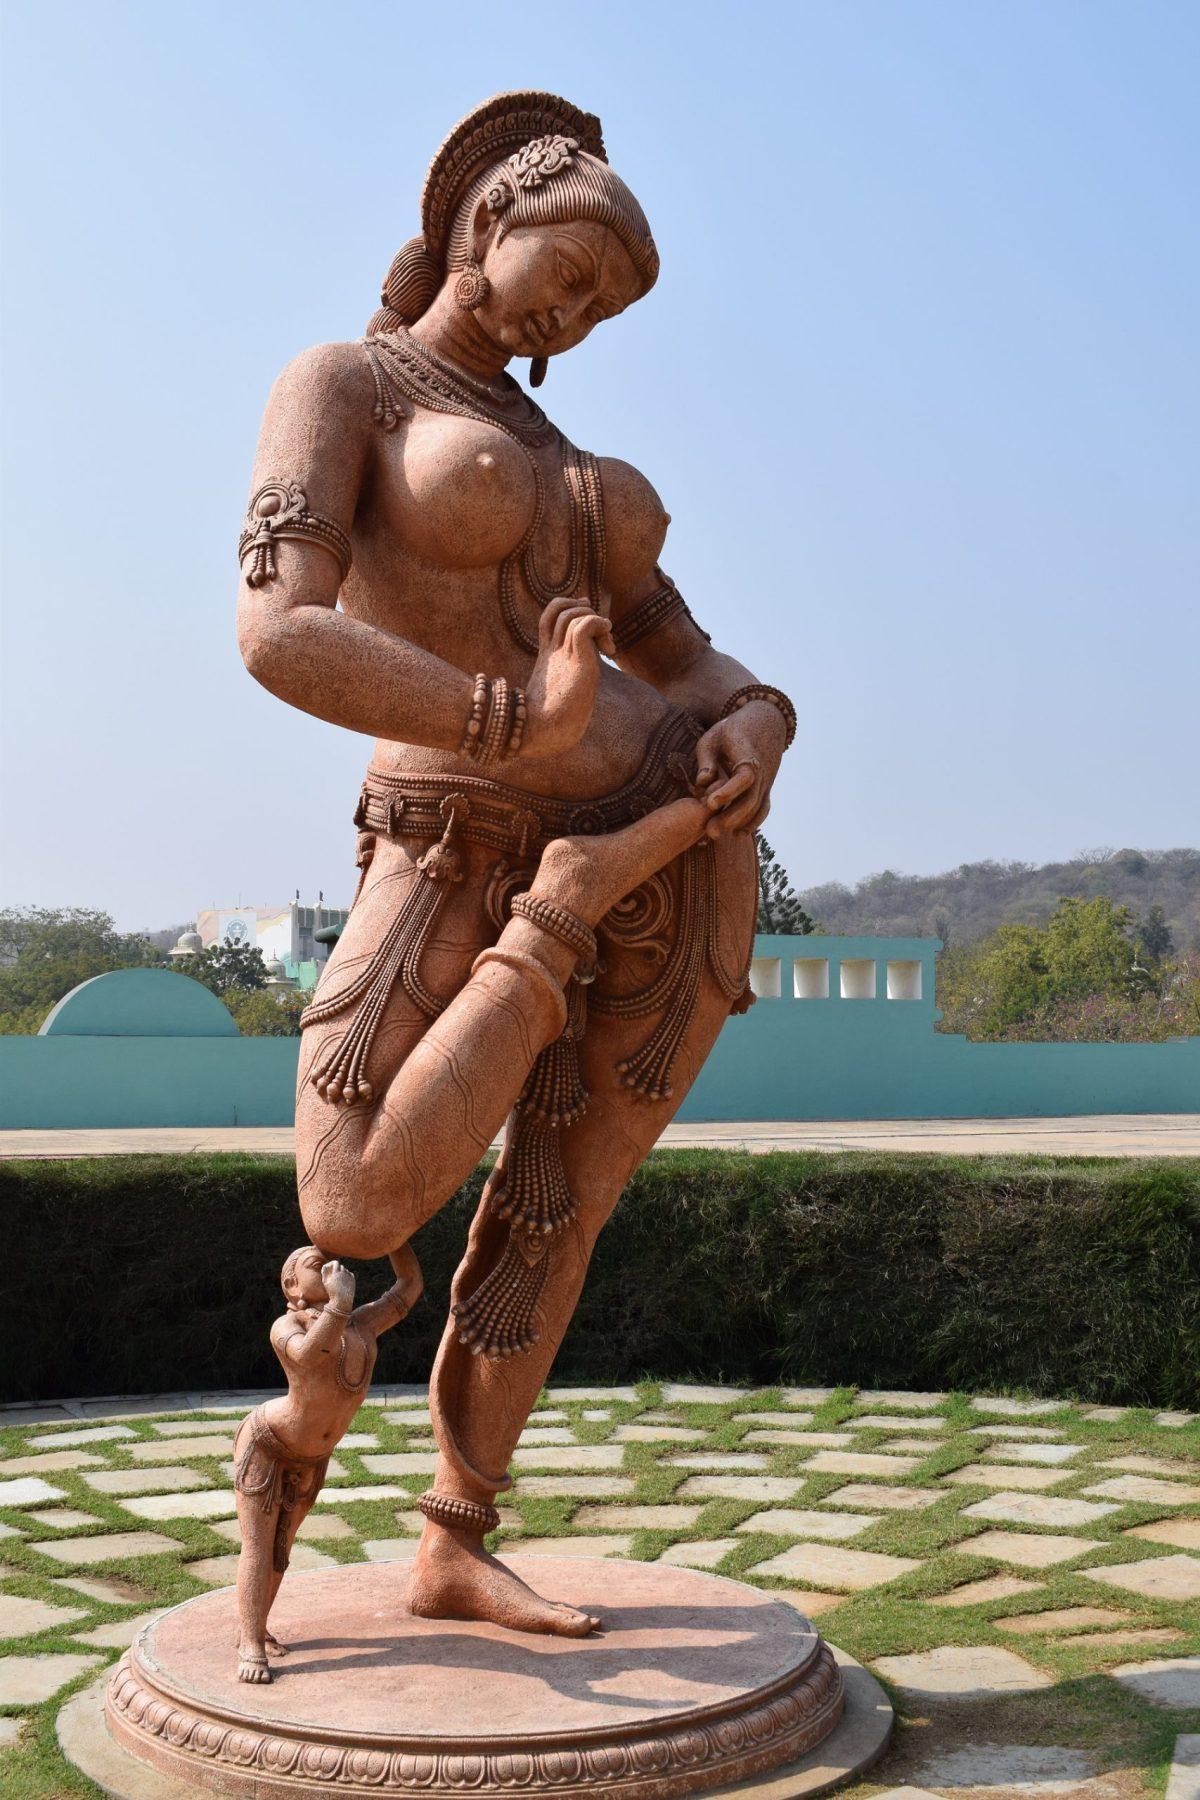 ramoji nude women statue